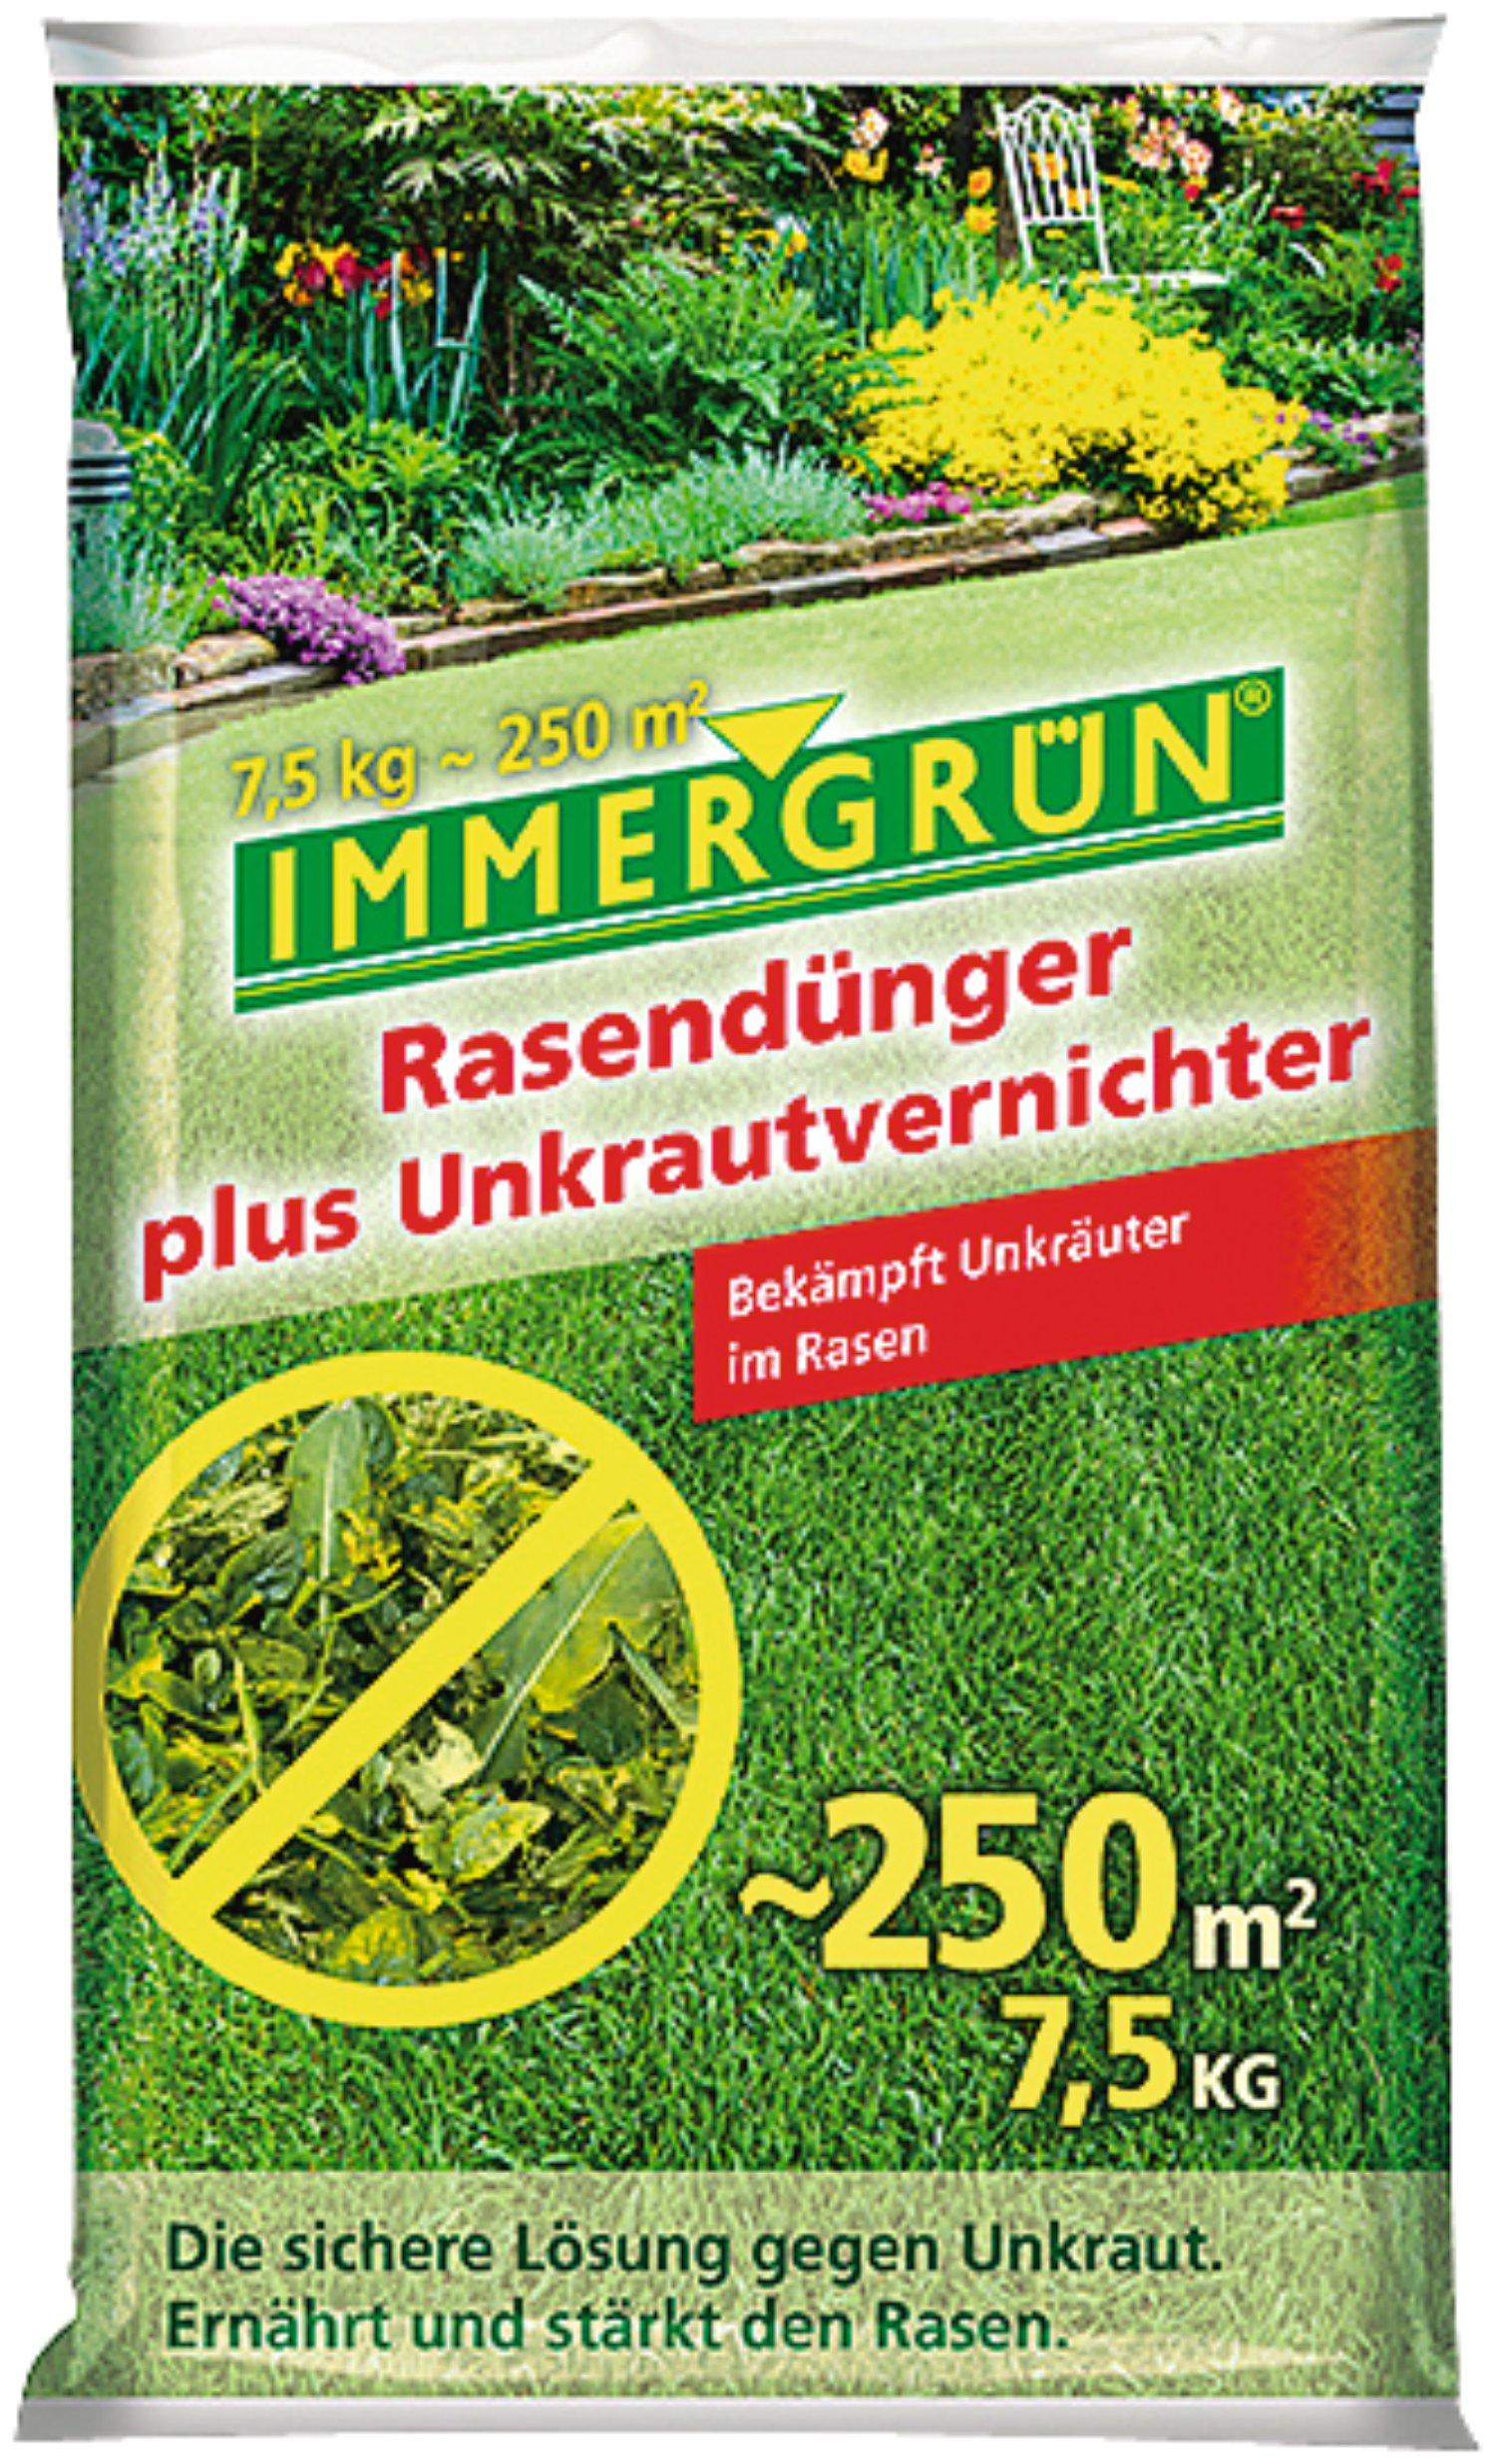 Immergrun Rasendunger Plus Unkrautvernichter 7 5 Kg Lagerhaus